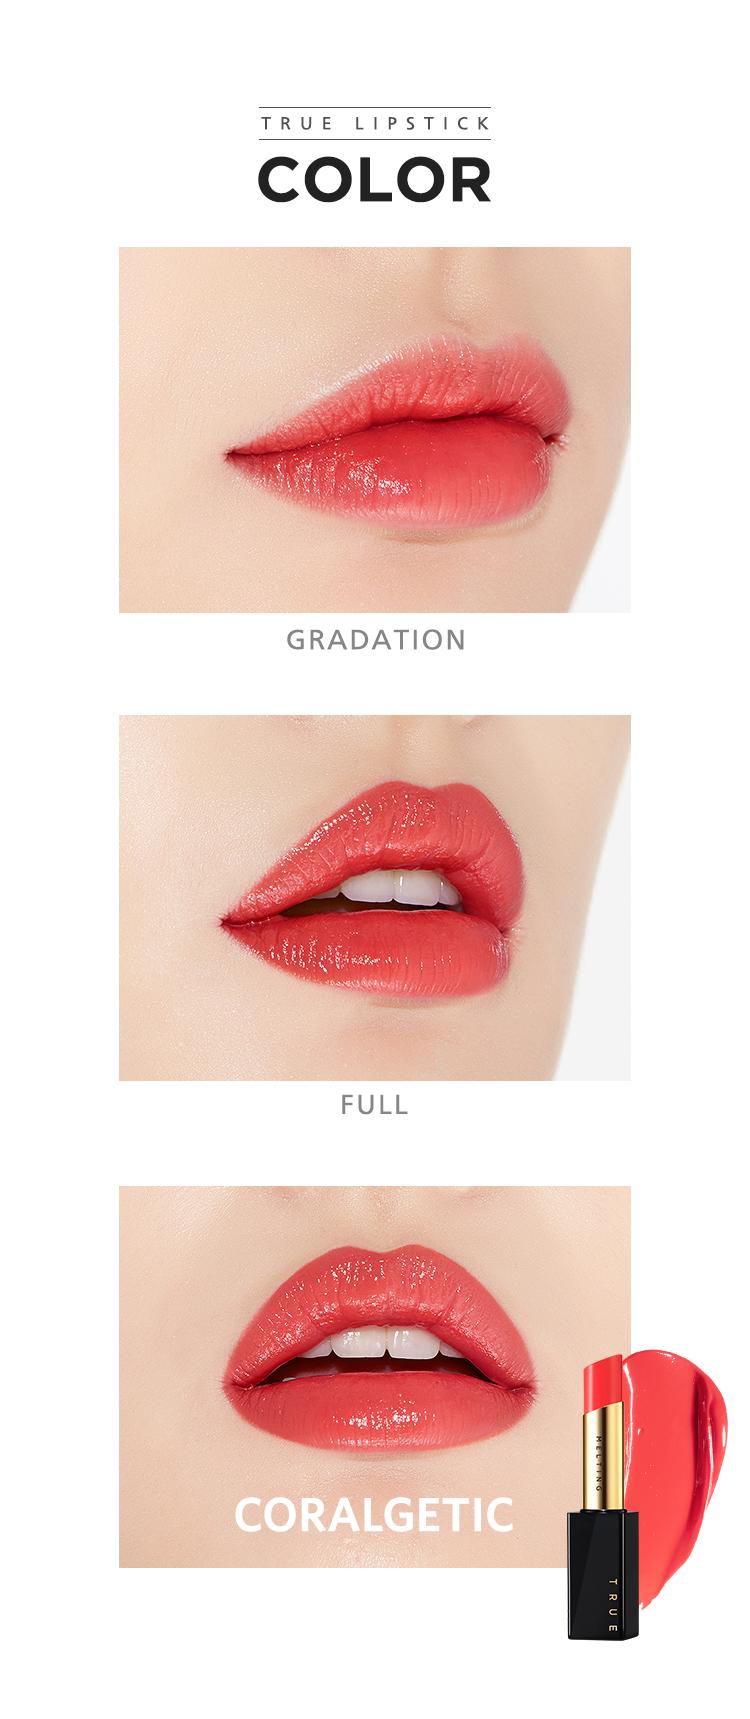 APIEU_True_Melting_Lipstick_bf_CR01_02.jpg